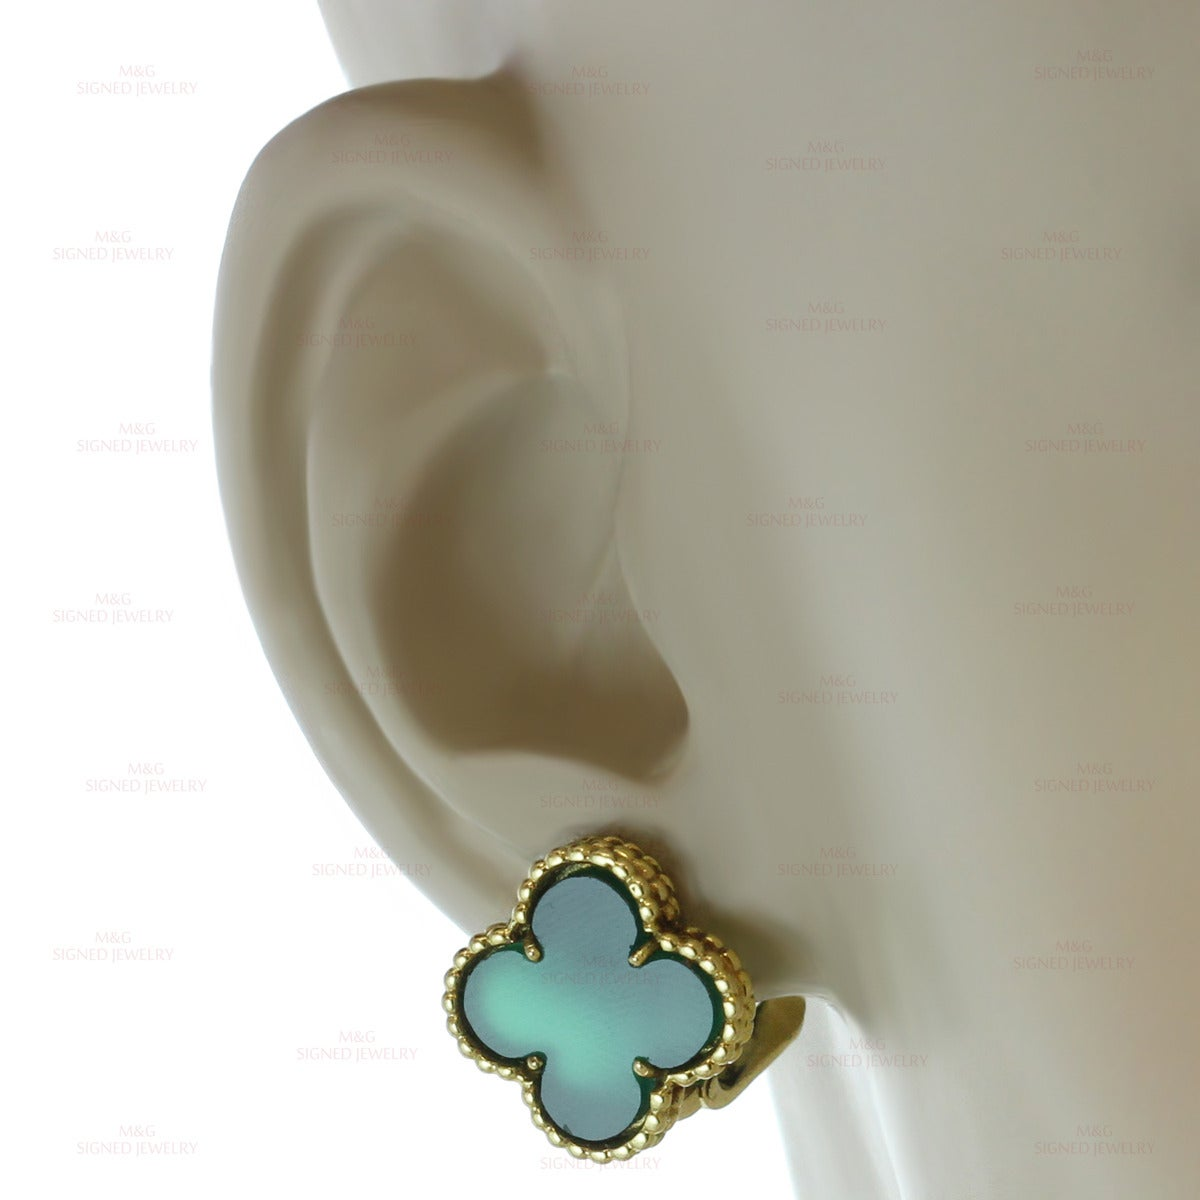 1970s Van Cleef & Arpels Alhambra Green Chalcedony Gold Earrings 5